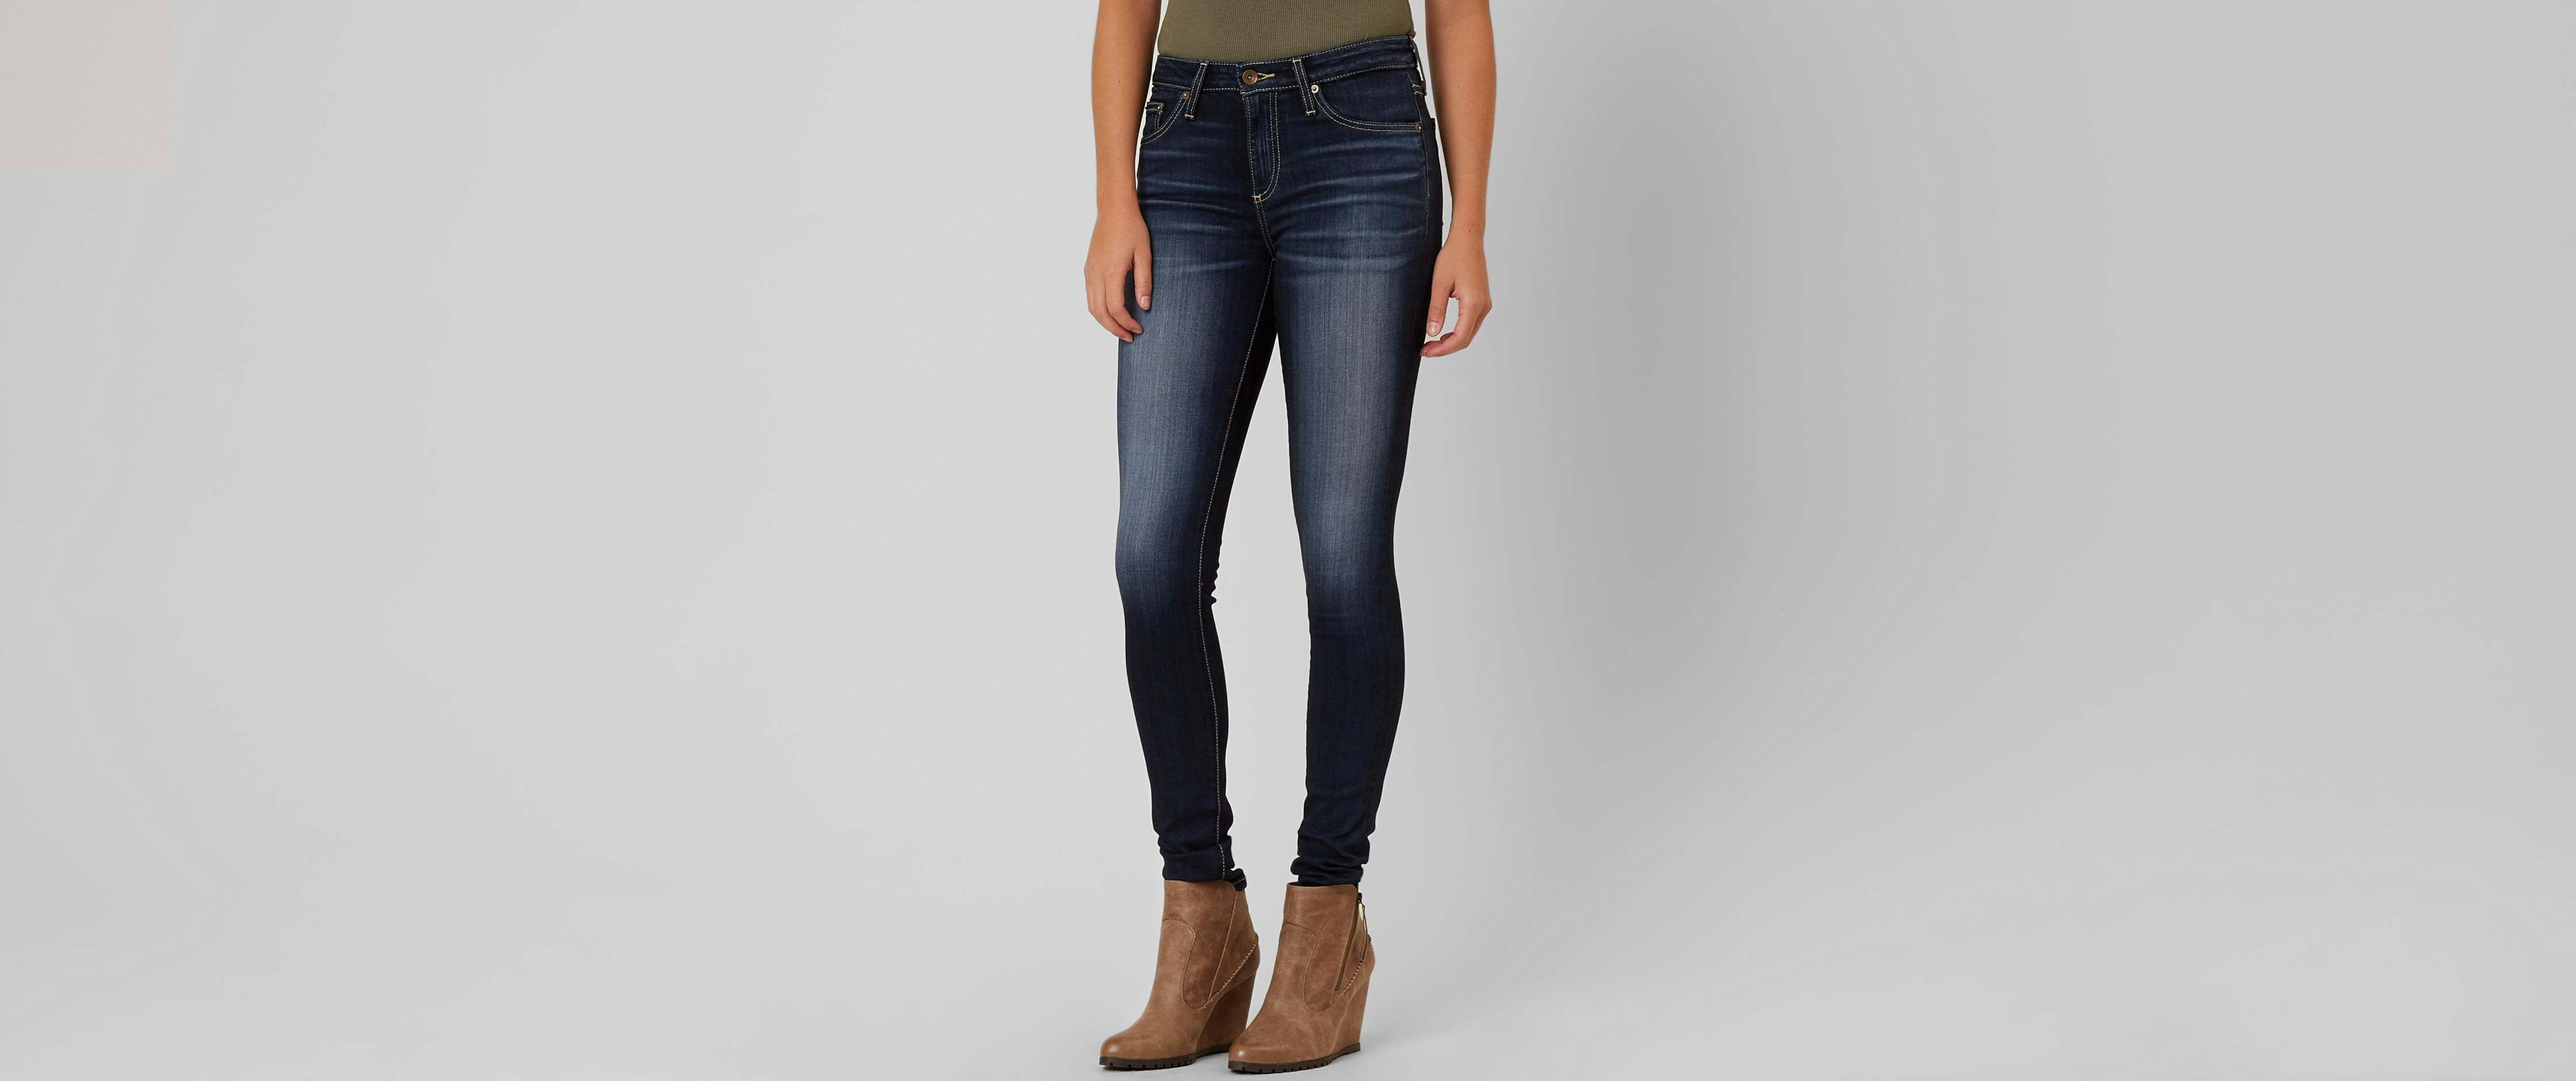 Big Star Vintage Desi High Rise Skinny Jean